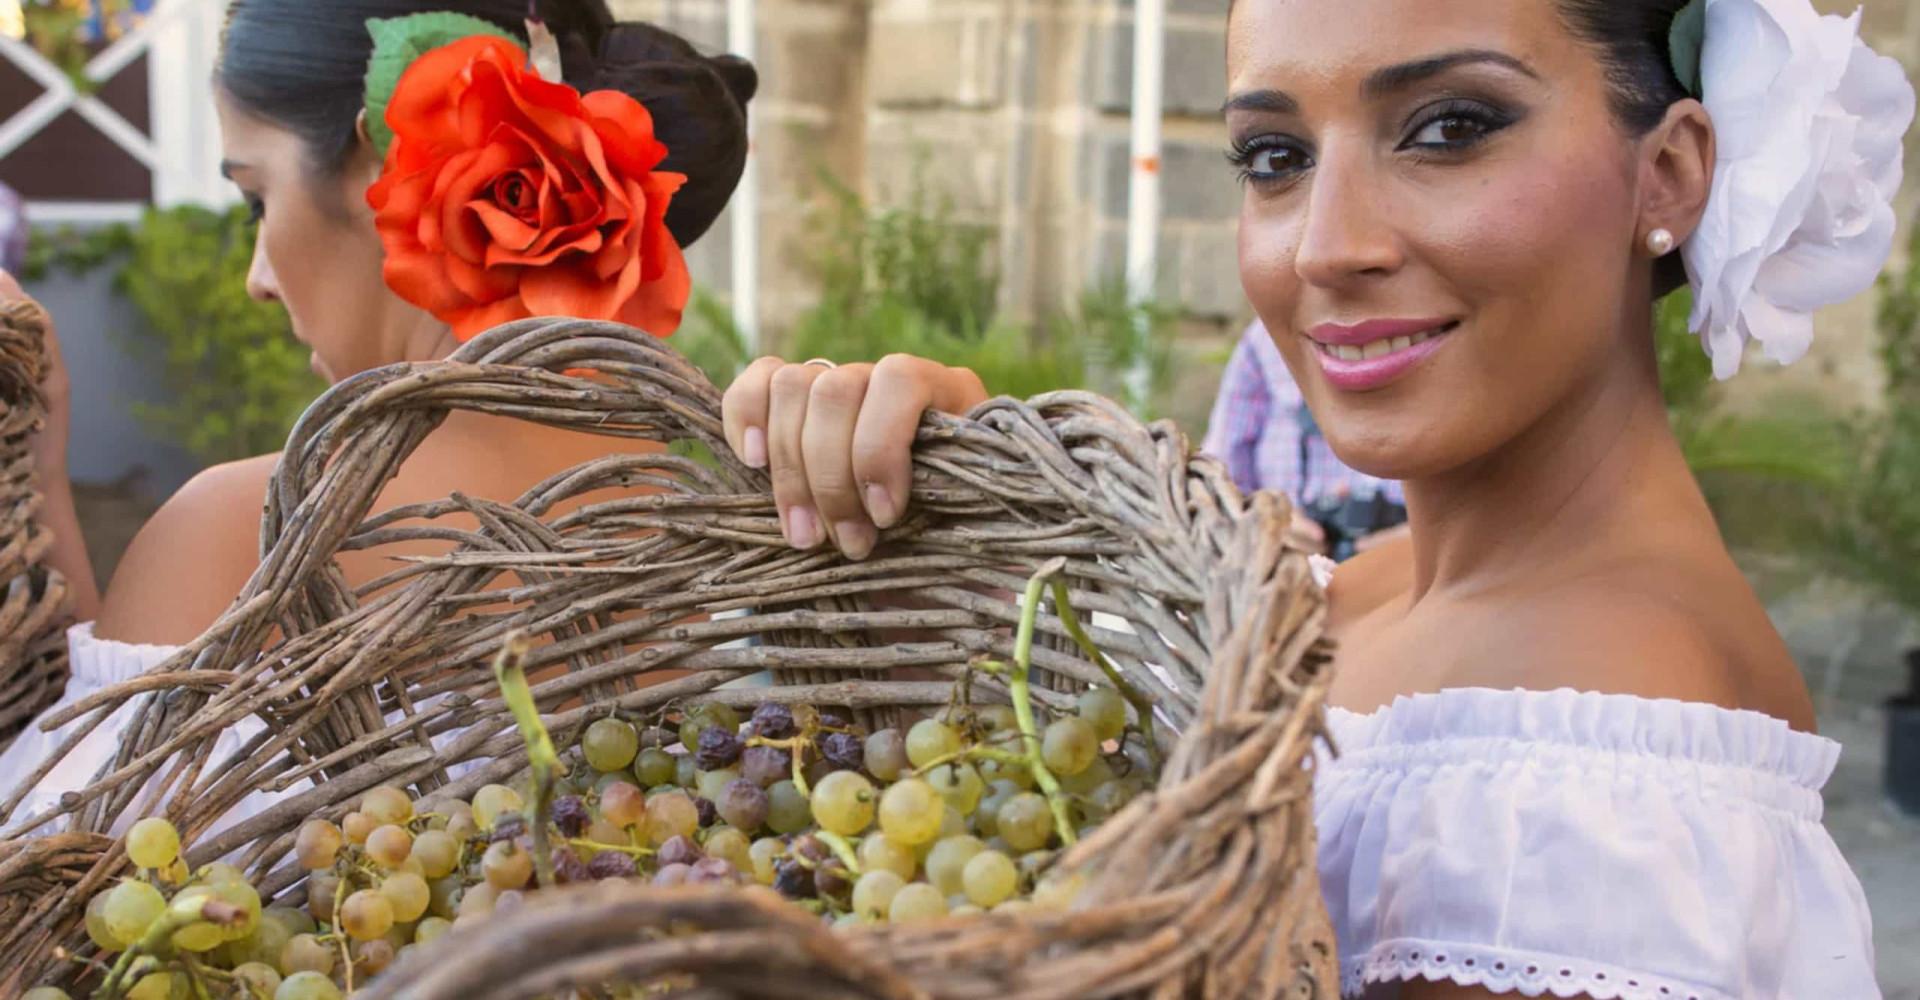 Utforsk Spanias fortryllende sherry-triangel